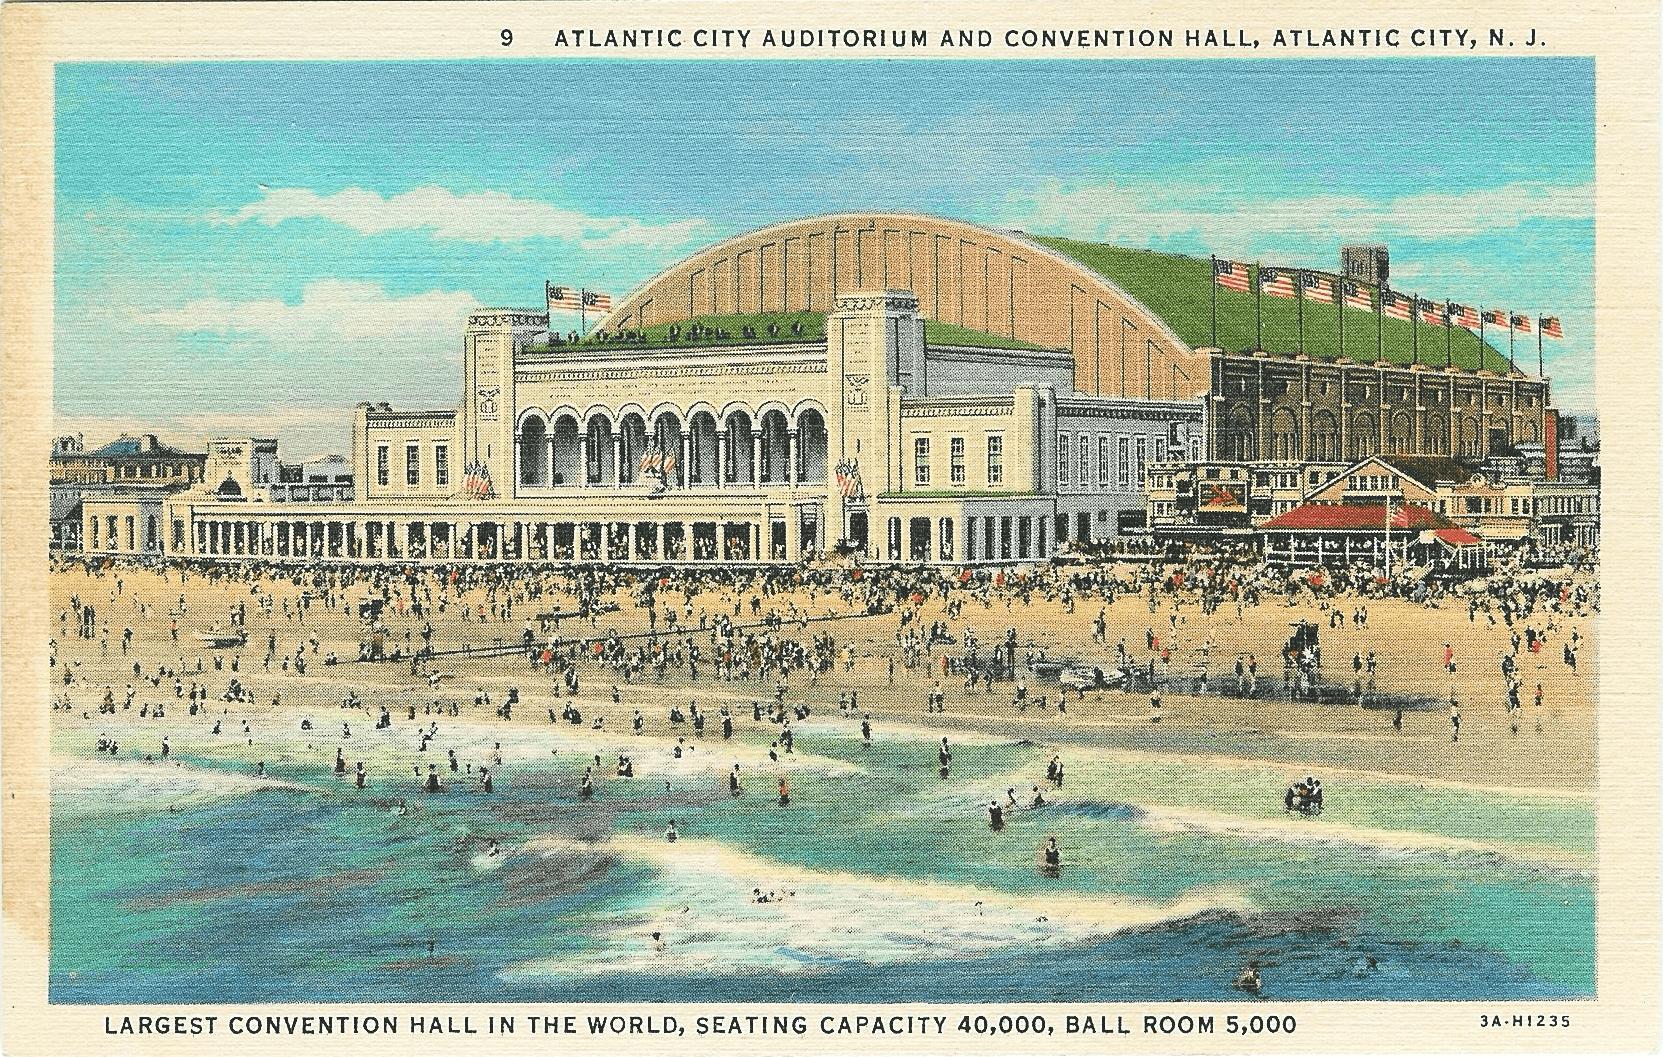 Atlantic City - Atlantic City Convention Center